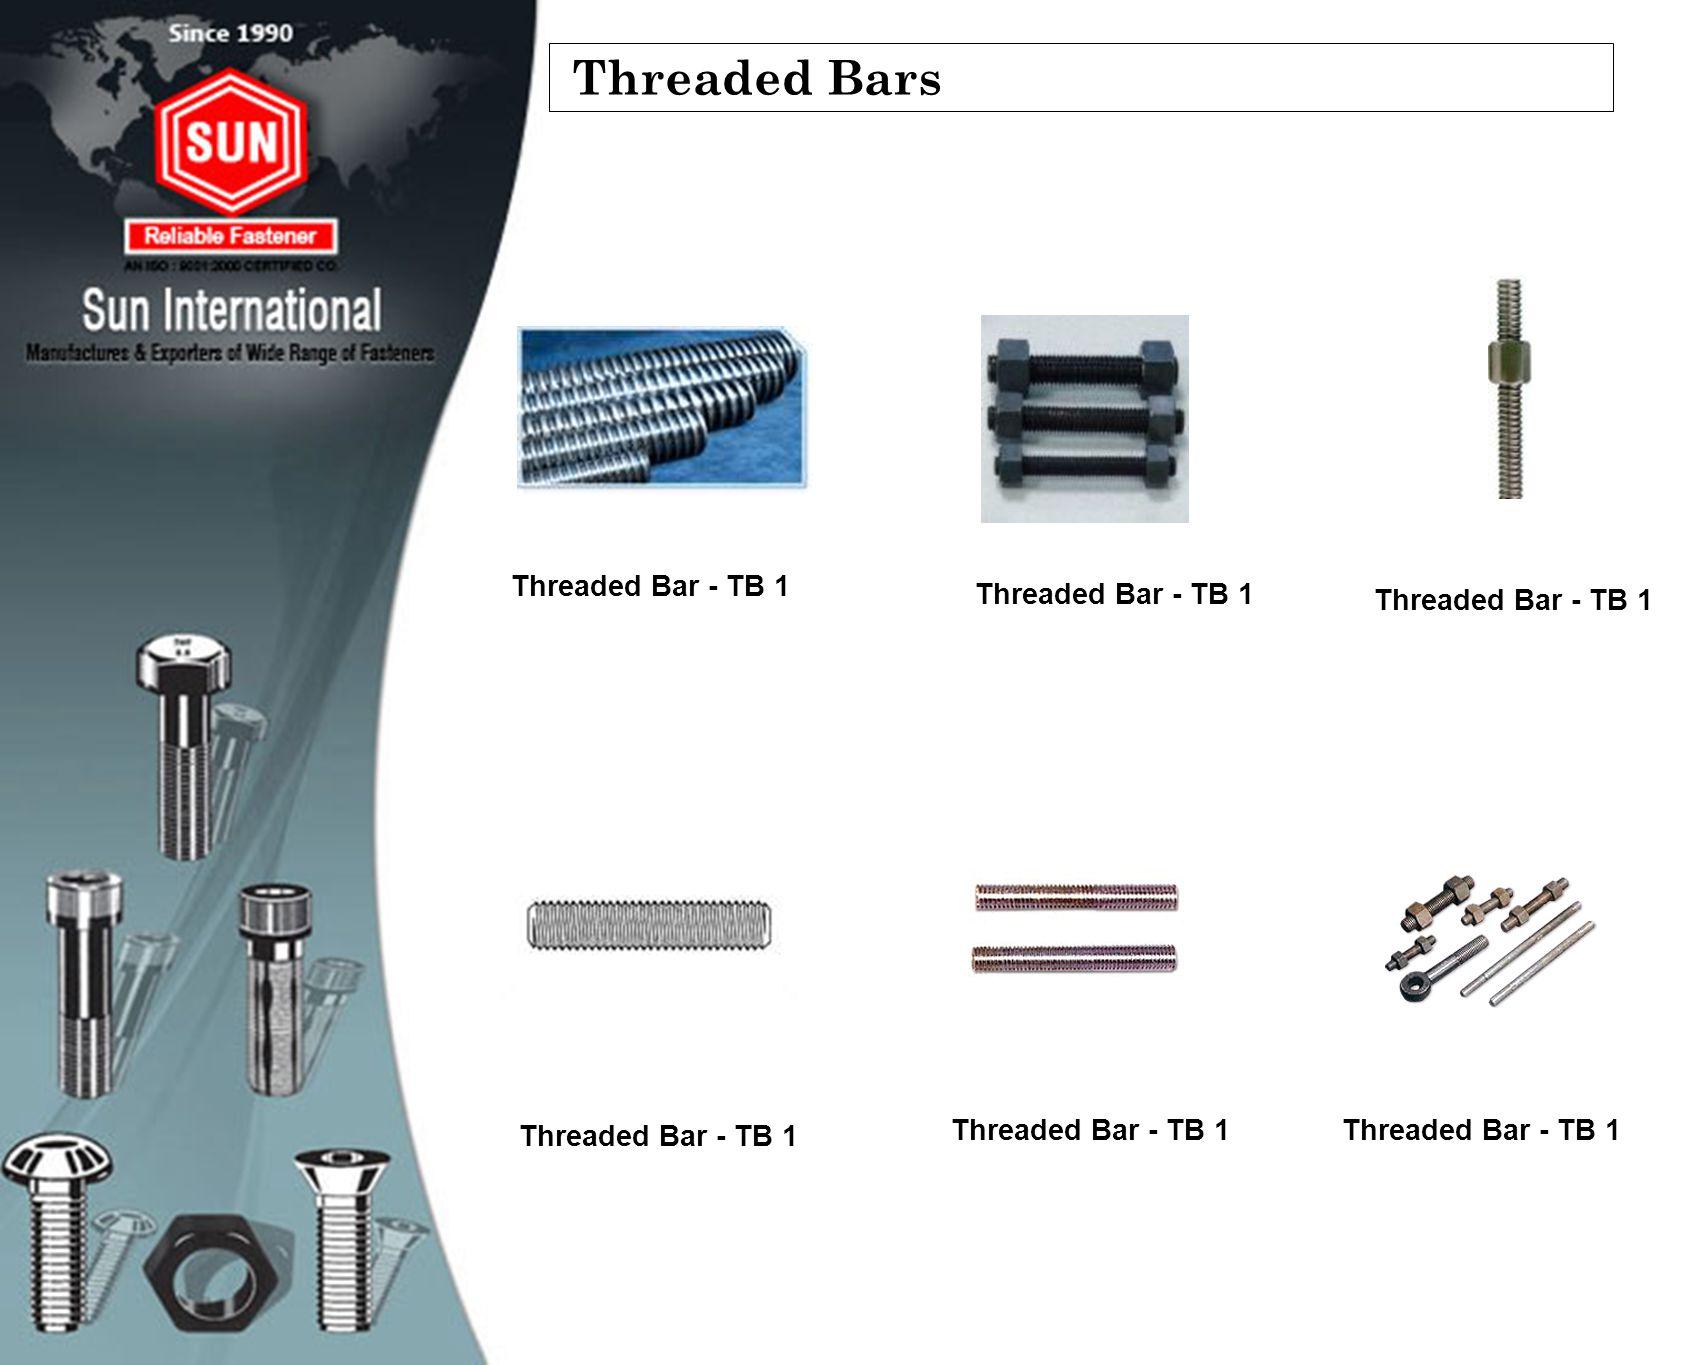 Threaded Bars Threaded Bar - TB 1 Threaded Bar - TB 1